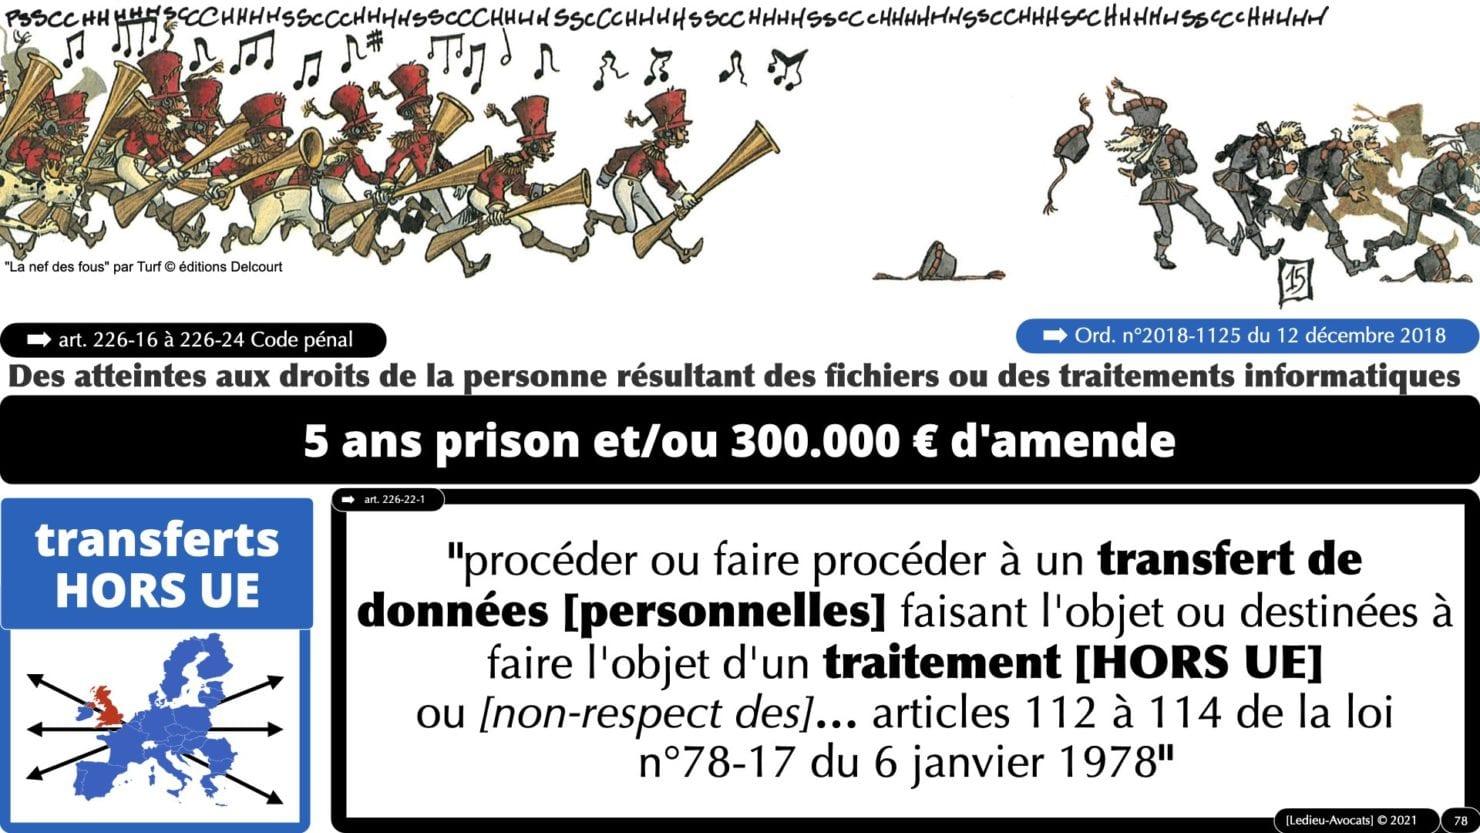 RGPD e-Privacy principes actualité jurisprudence ©Ledieu-Avocats 25-06-2021.078